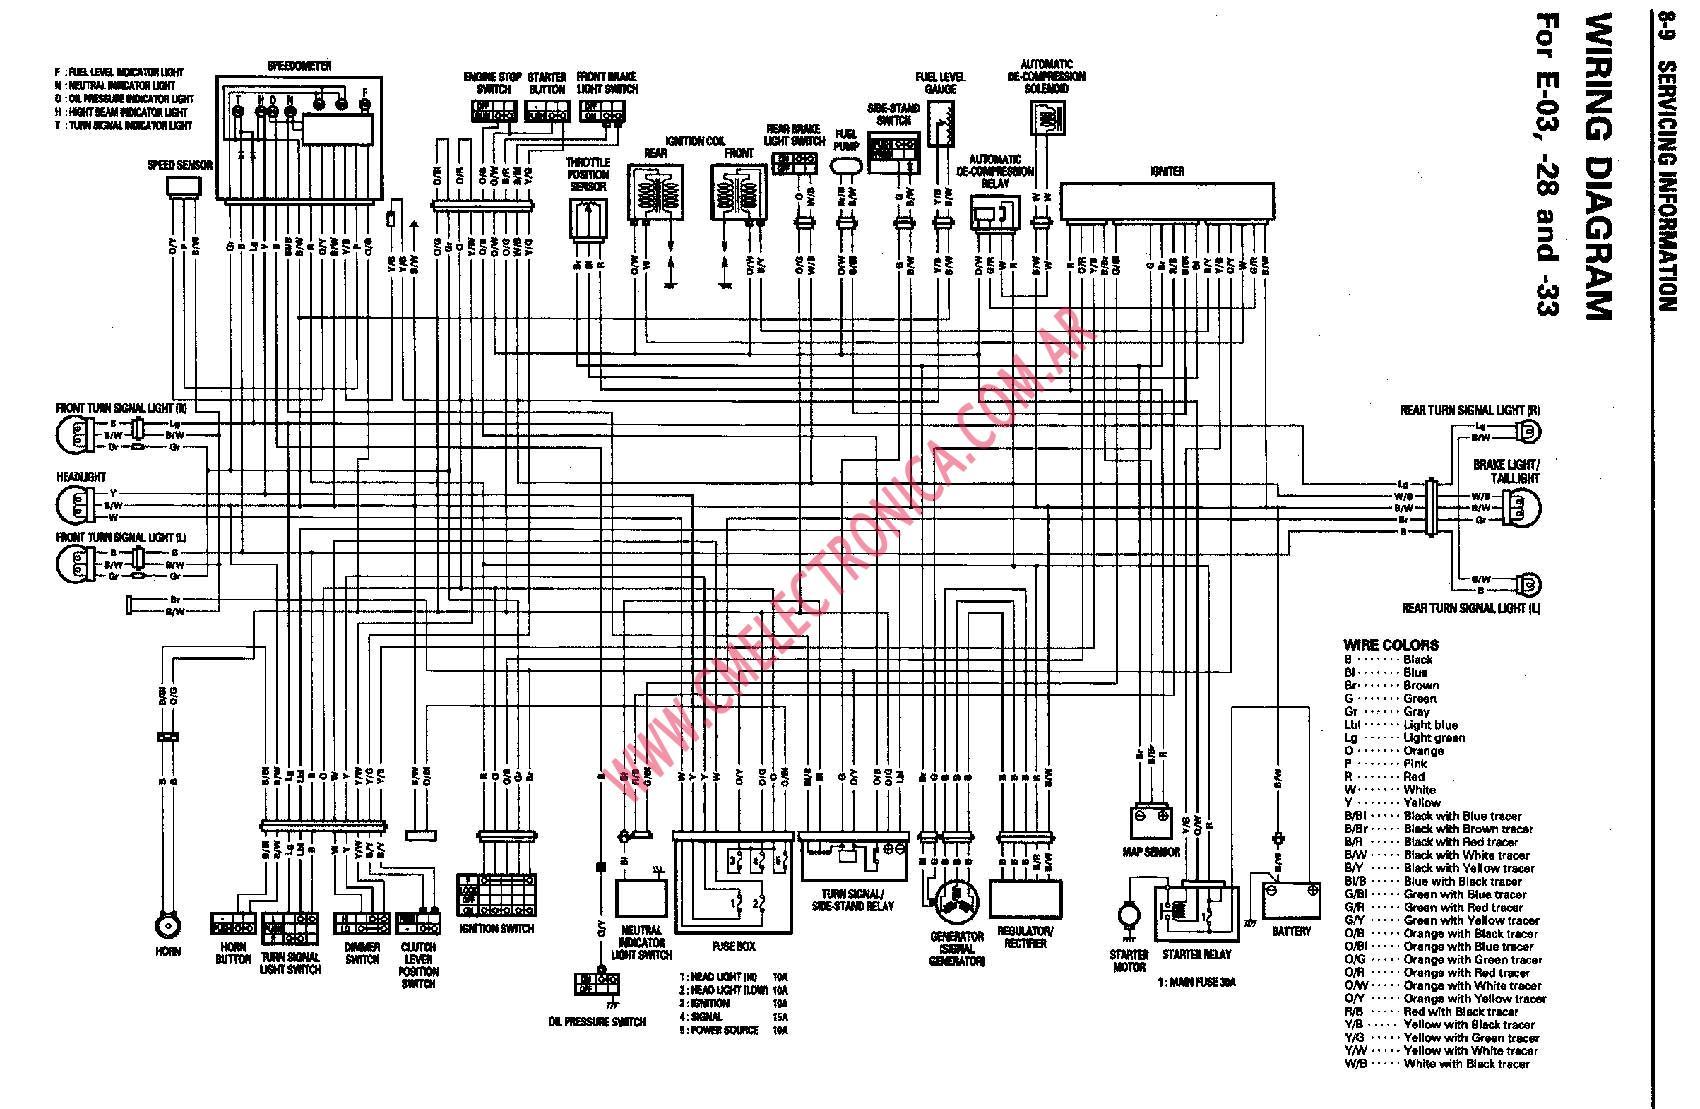 Cool suzuki drz 250 wiring diagram photos electrical circuit extraordinary suzuki ozark 250 wiring diagram contemporary best asfbconference2016 Choice Image